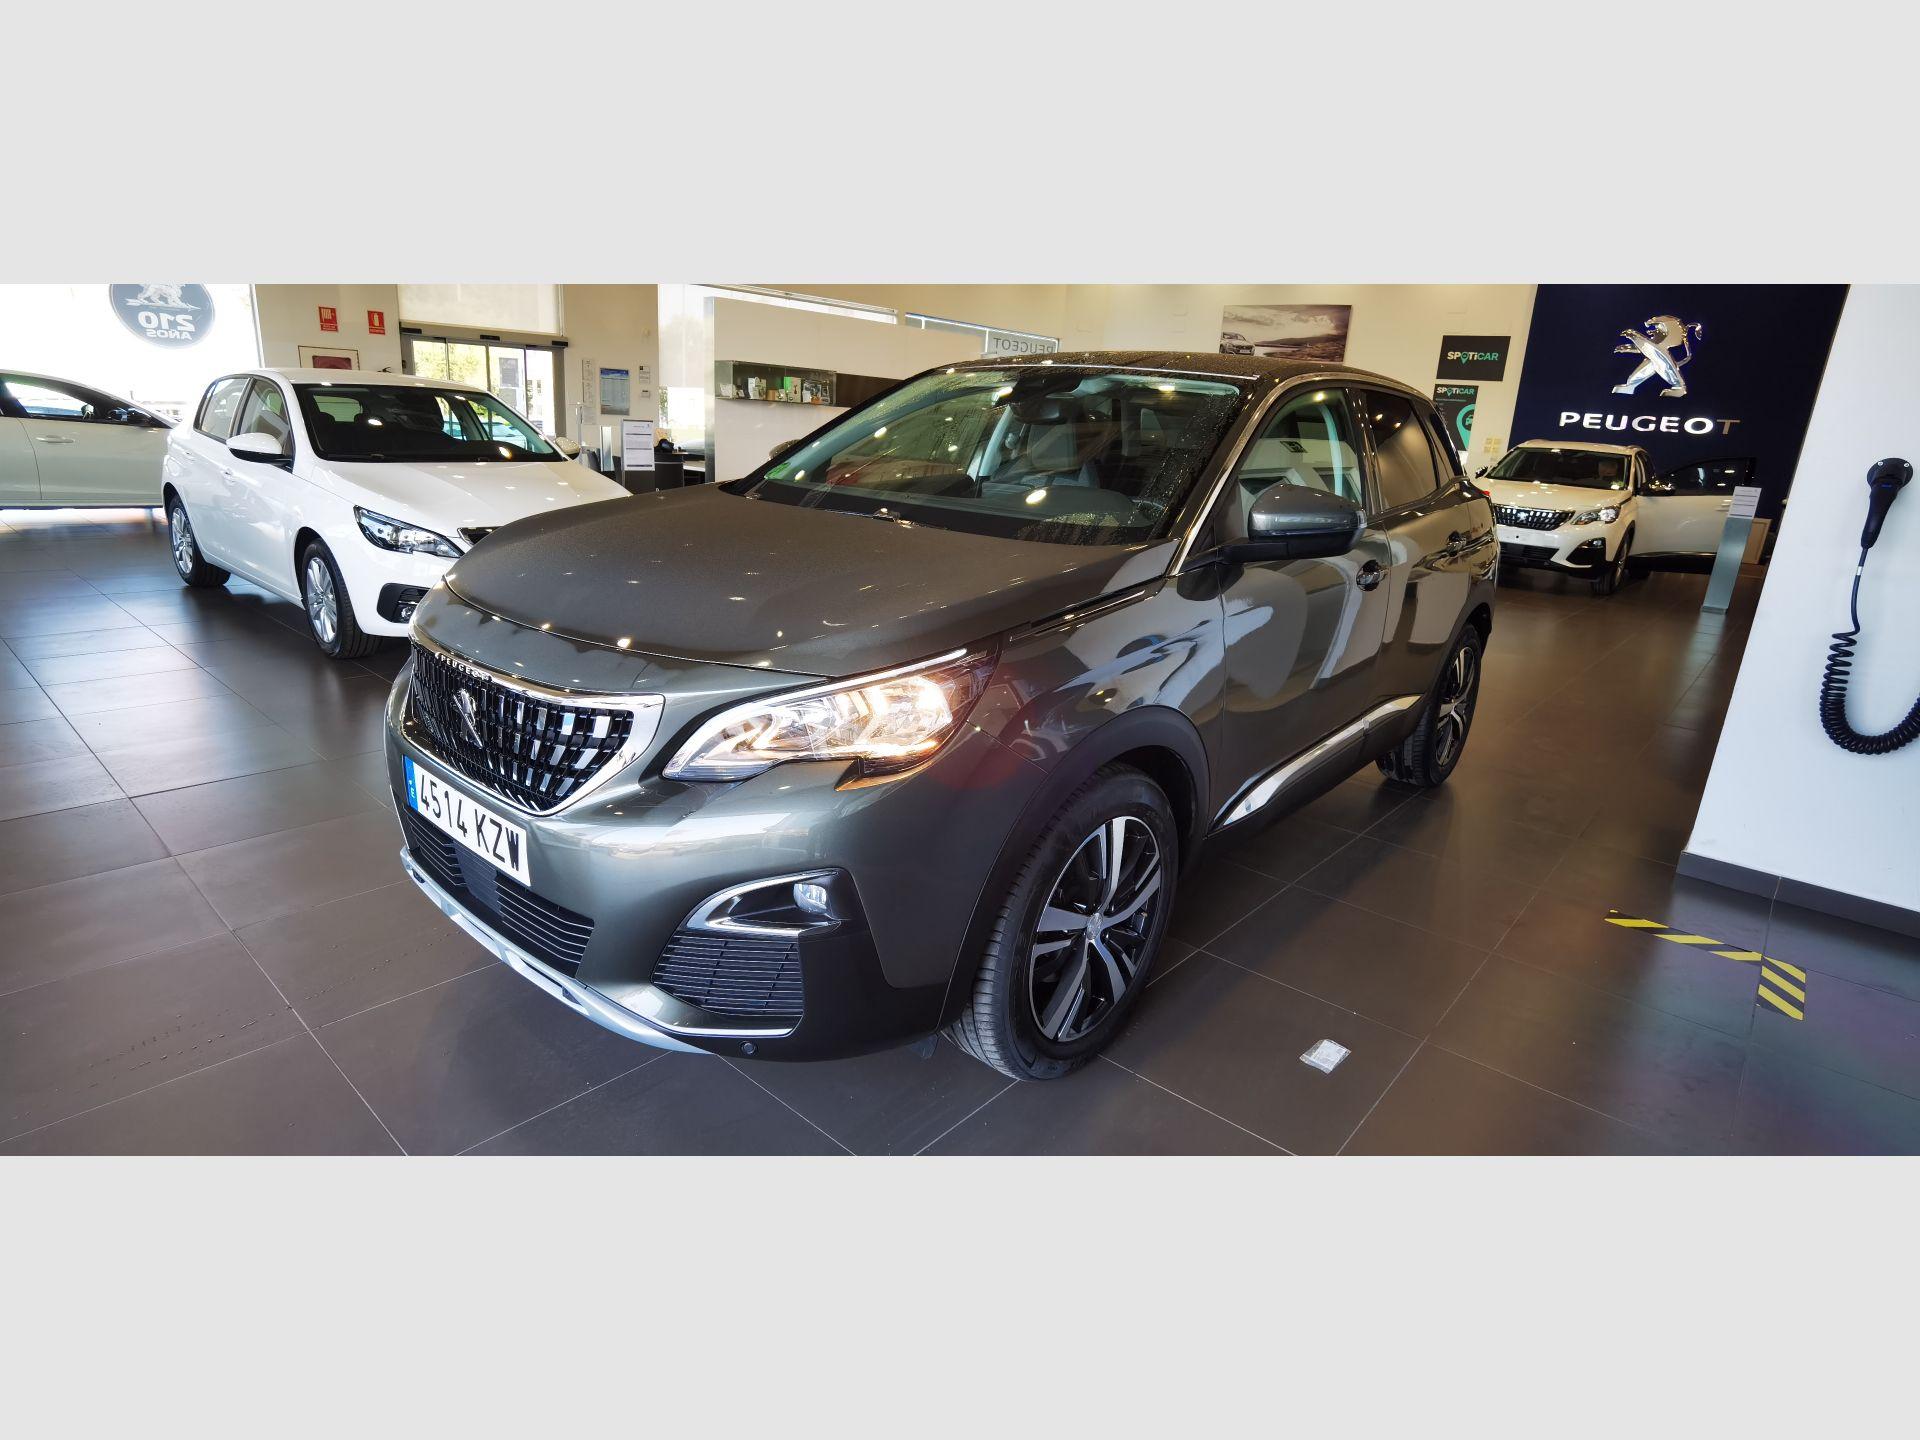 Peugeot 3008 1.2 PURETECH 96KW (130CV) ALLURE S&S segunda mano Cádiz